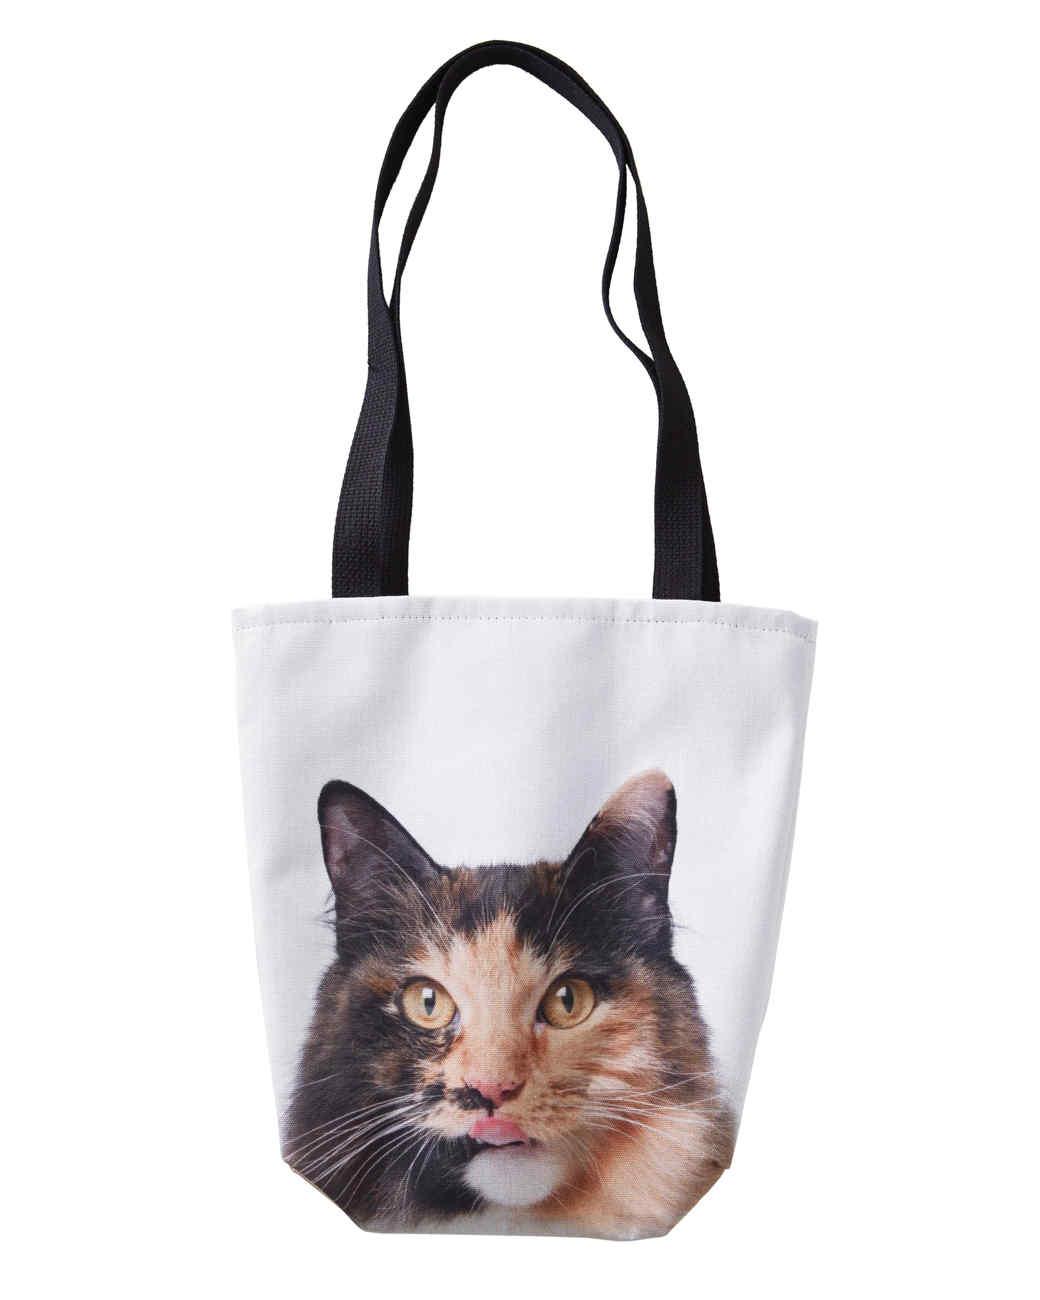 animal-print-bags-345-d112983_l.jpg